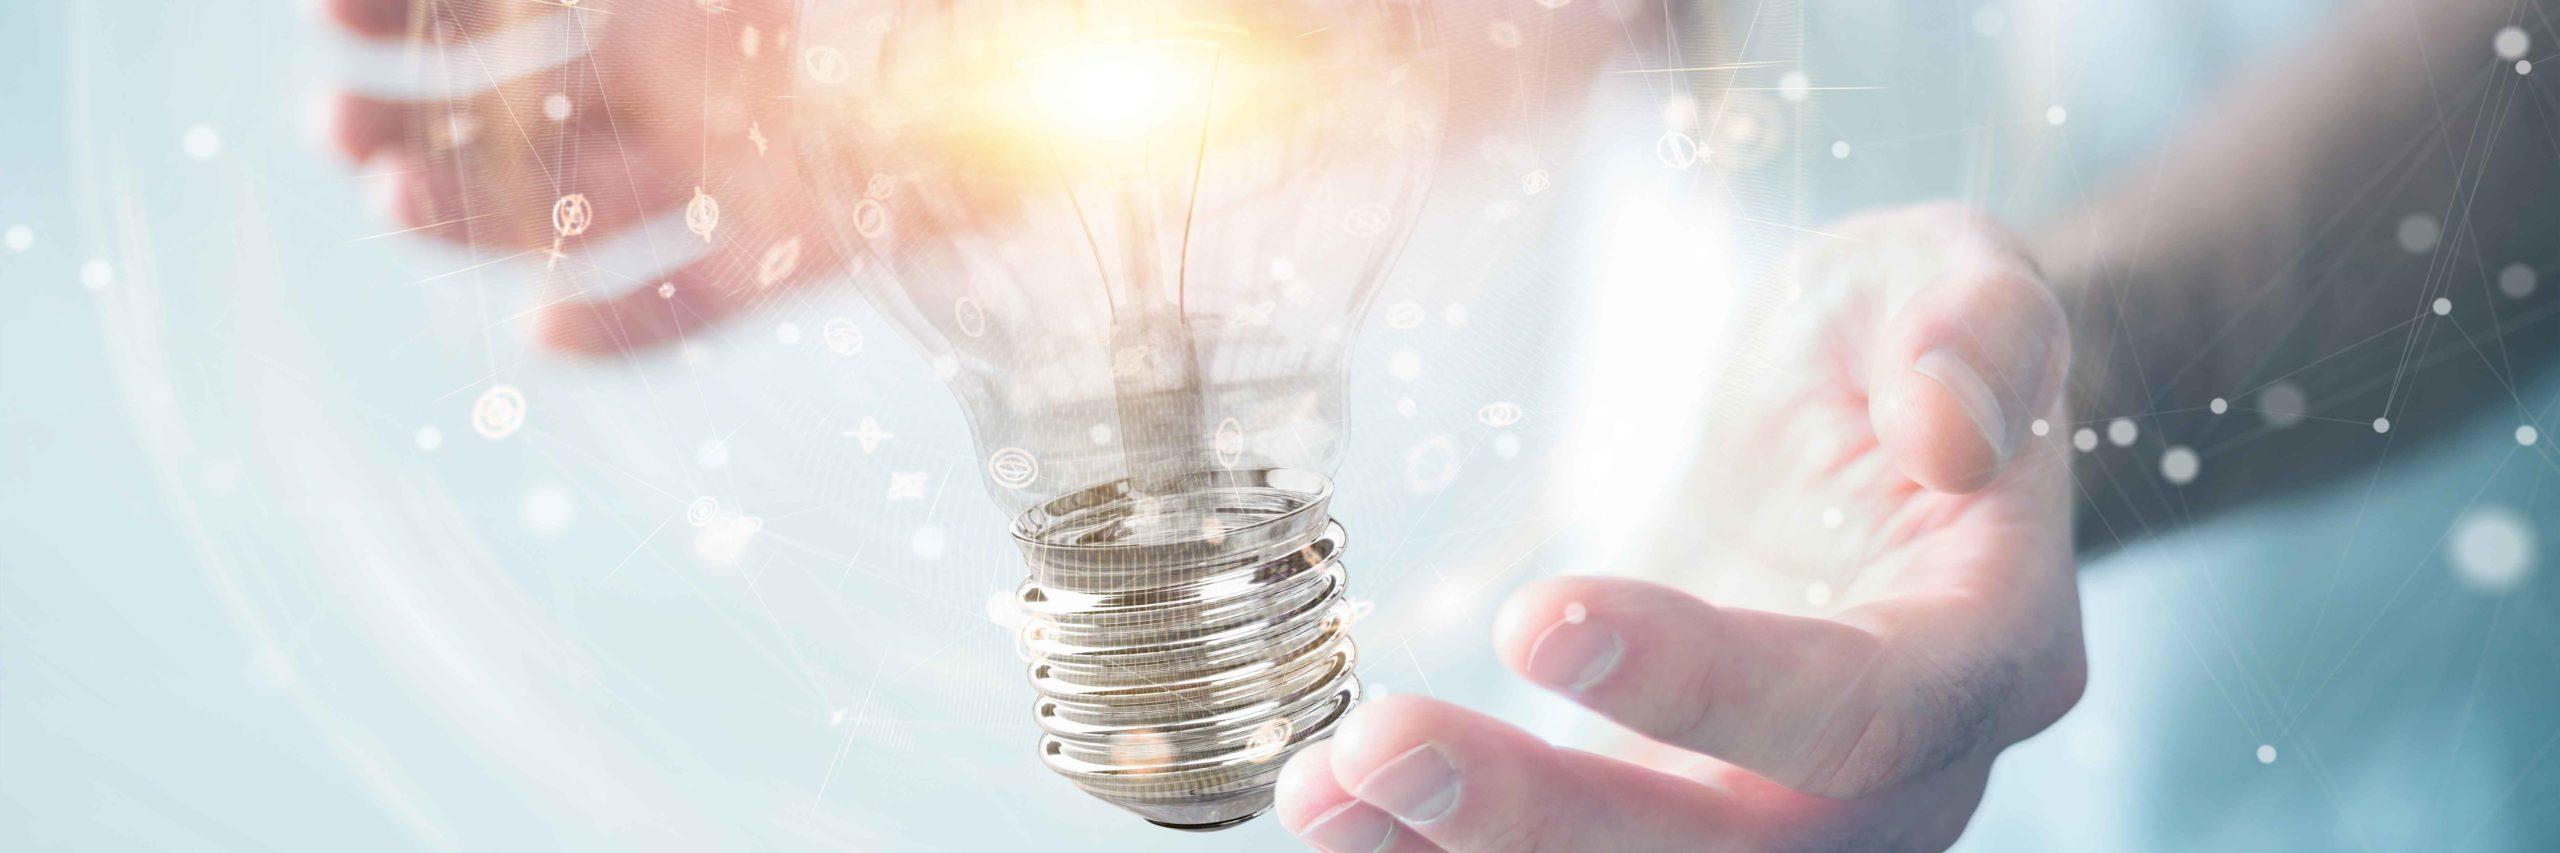 Hände halten Glühbirne, Innovation